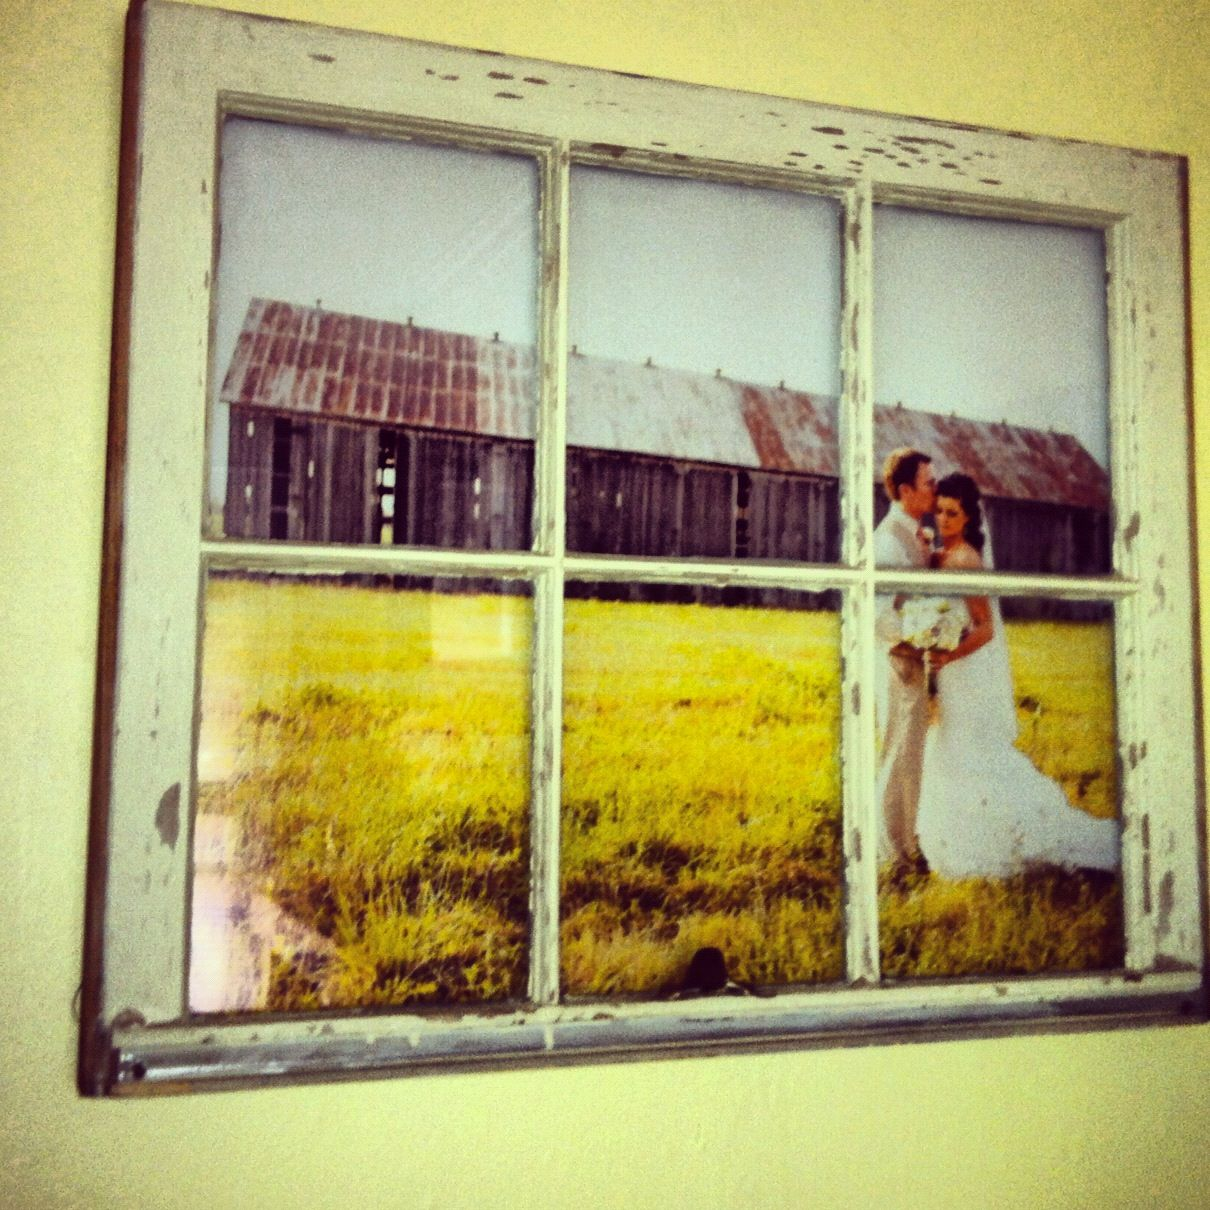 Diy Vintage Window Pane Picture Frame Diy Window Window Pane Picture Frame Window Pane Pictures